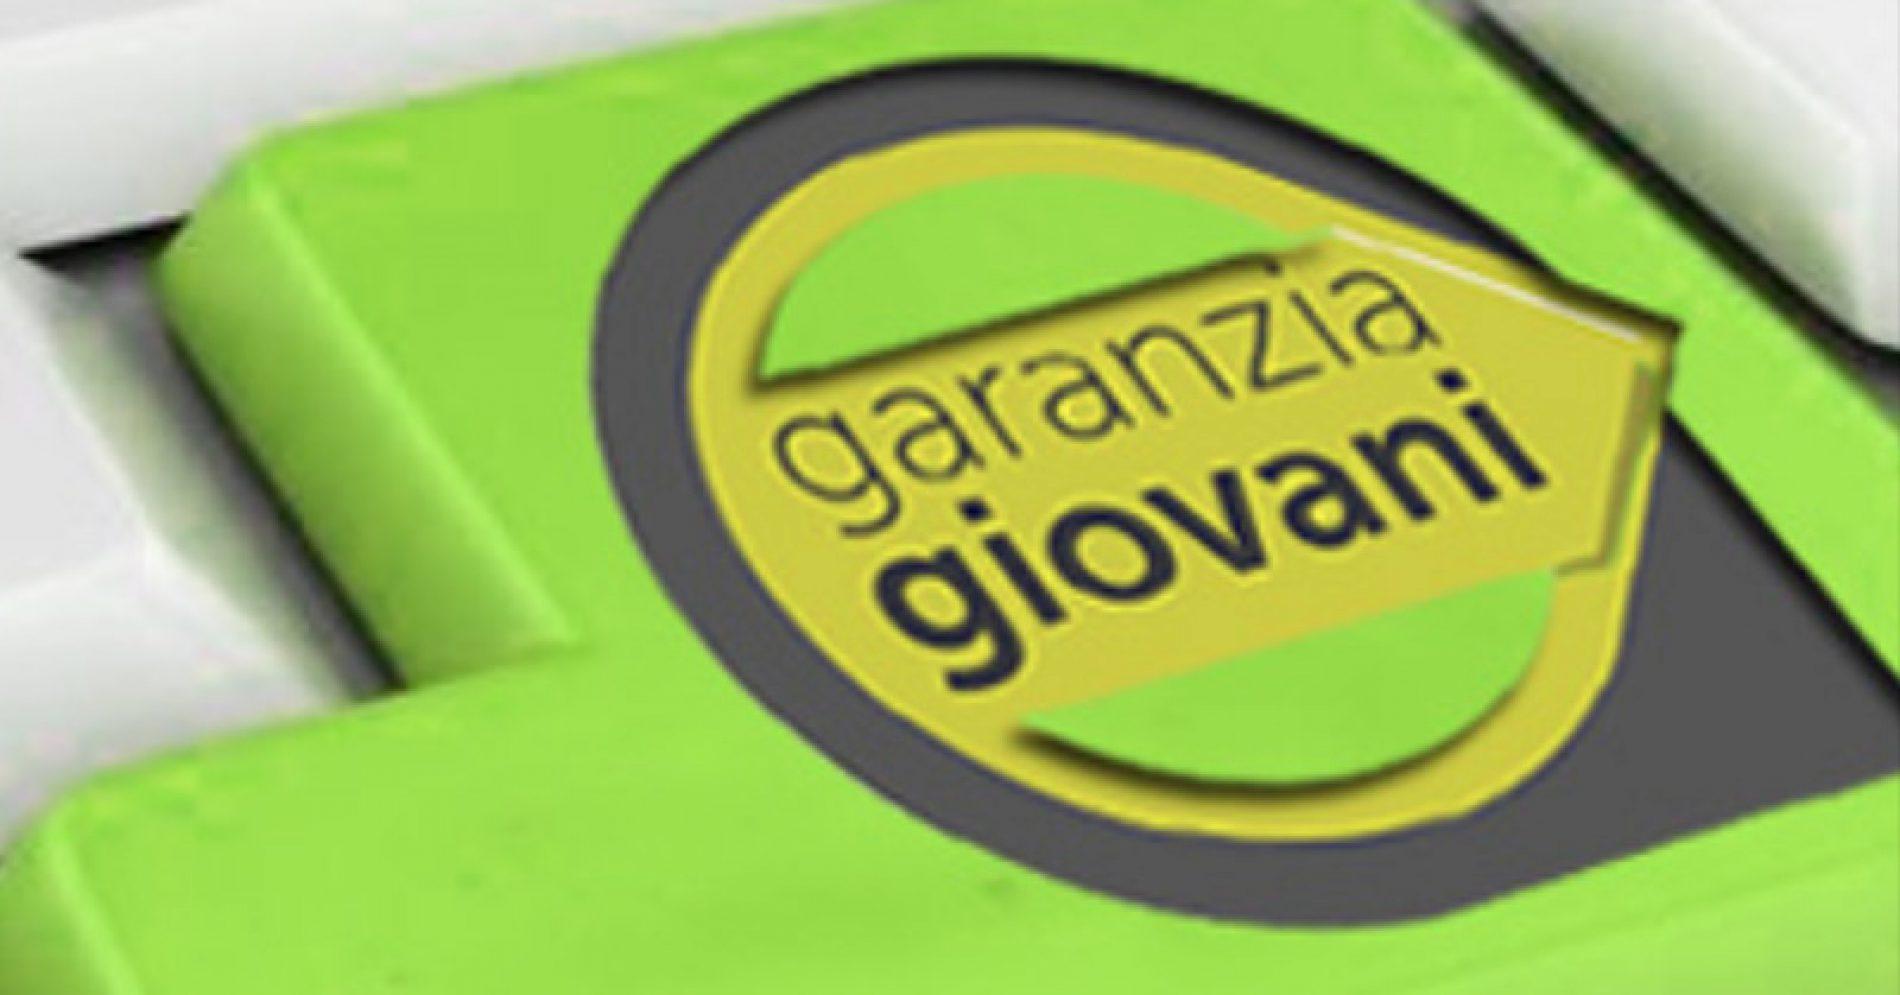 Incentivo per l'assunzione di tirocinanti in Garanzia Giovani [cir. 89/16 INPS]